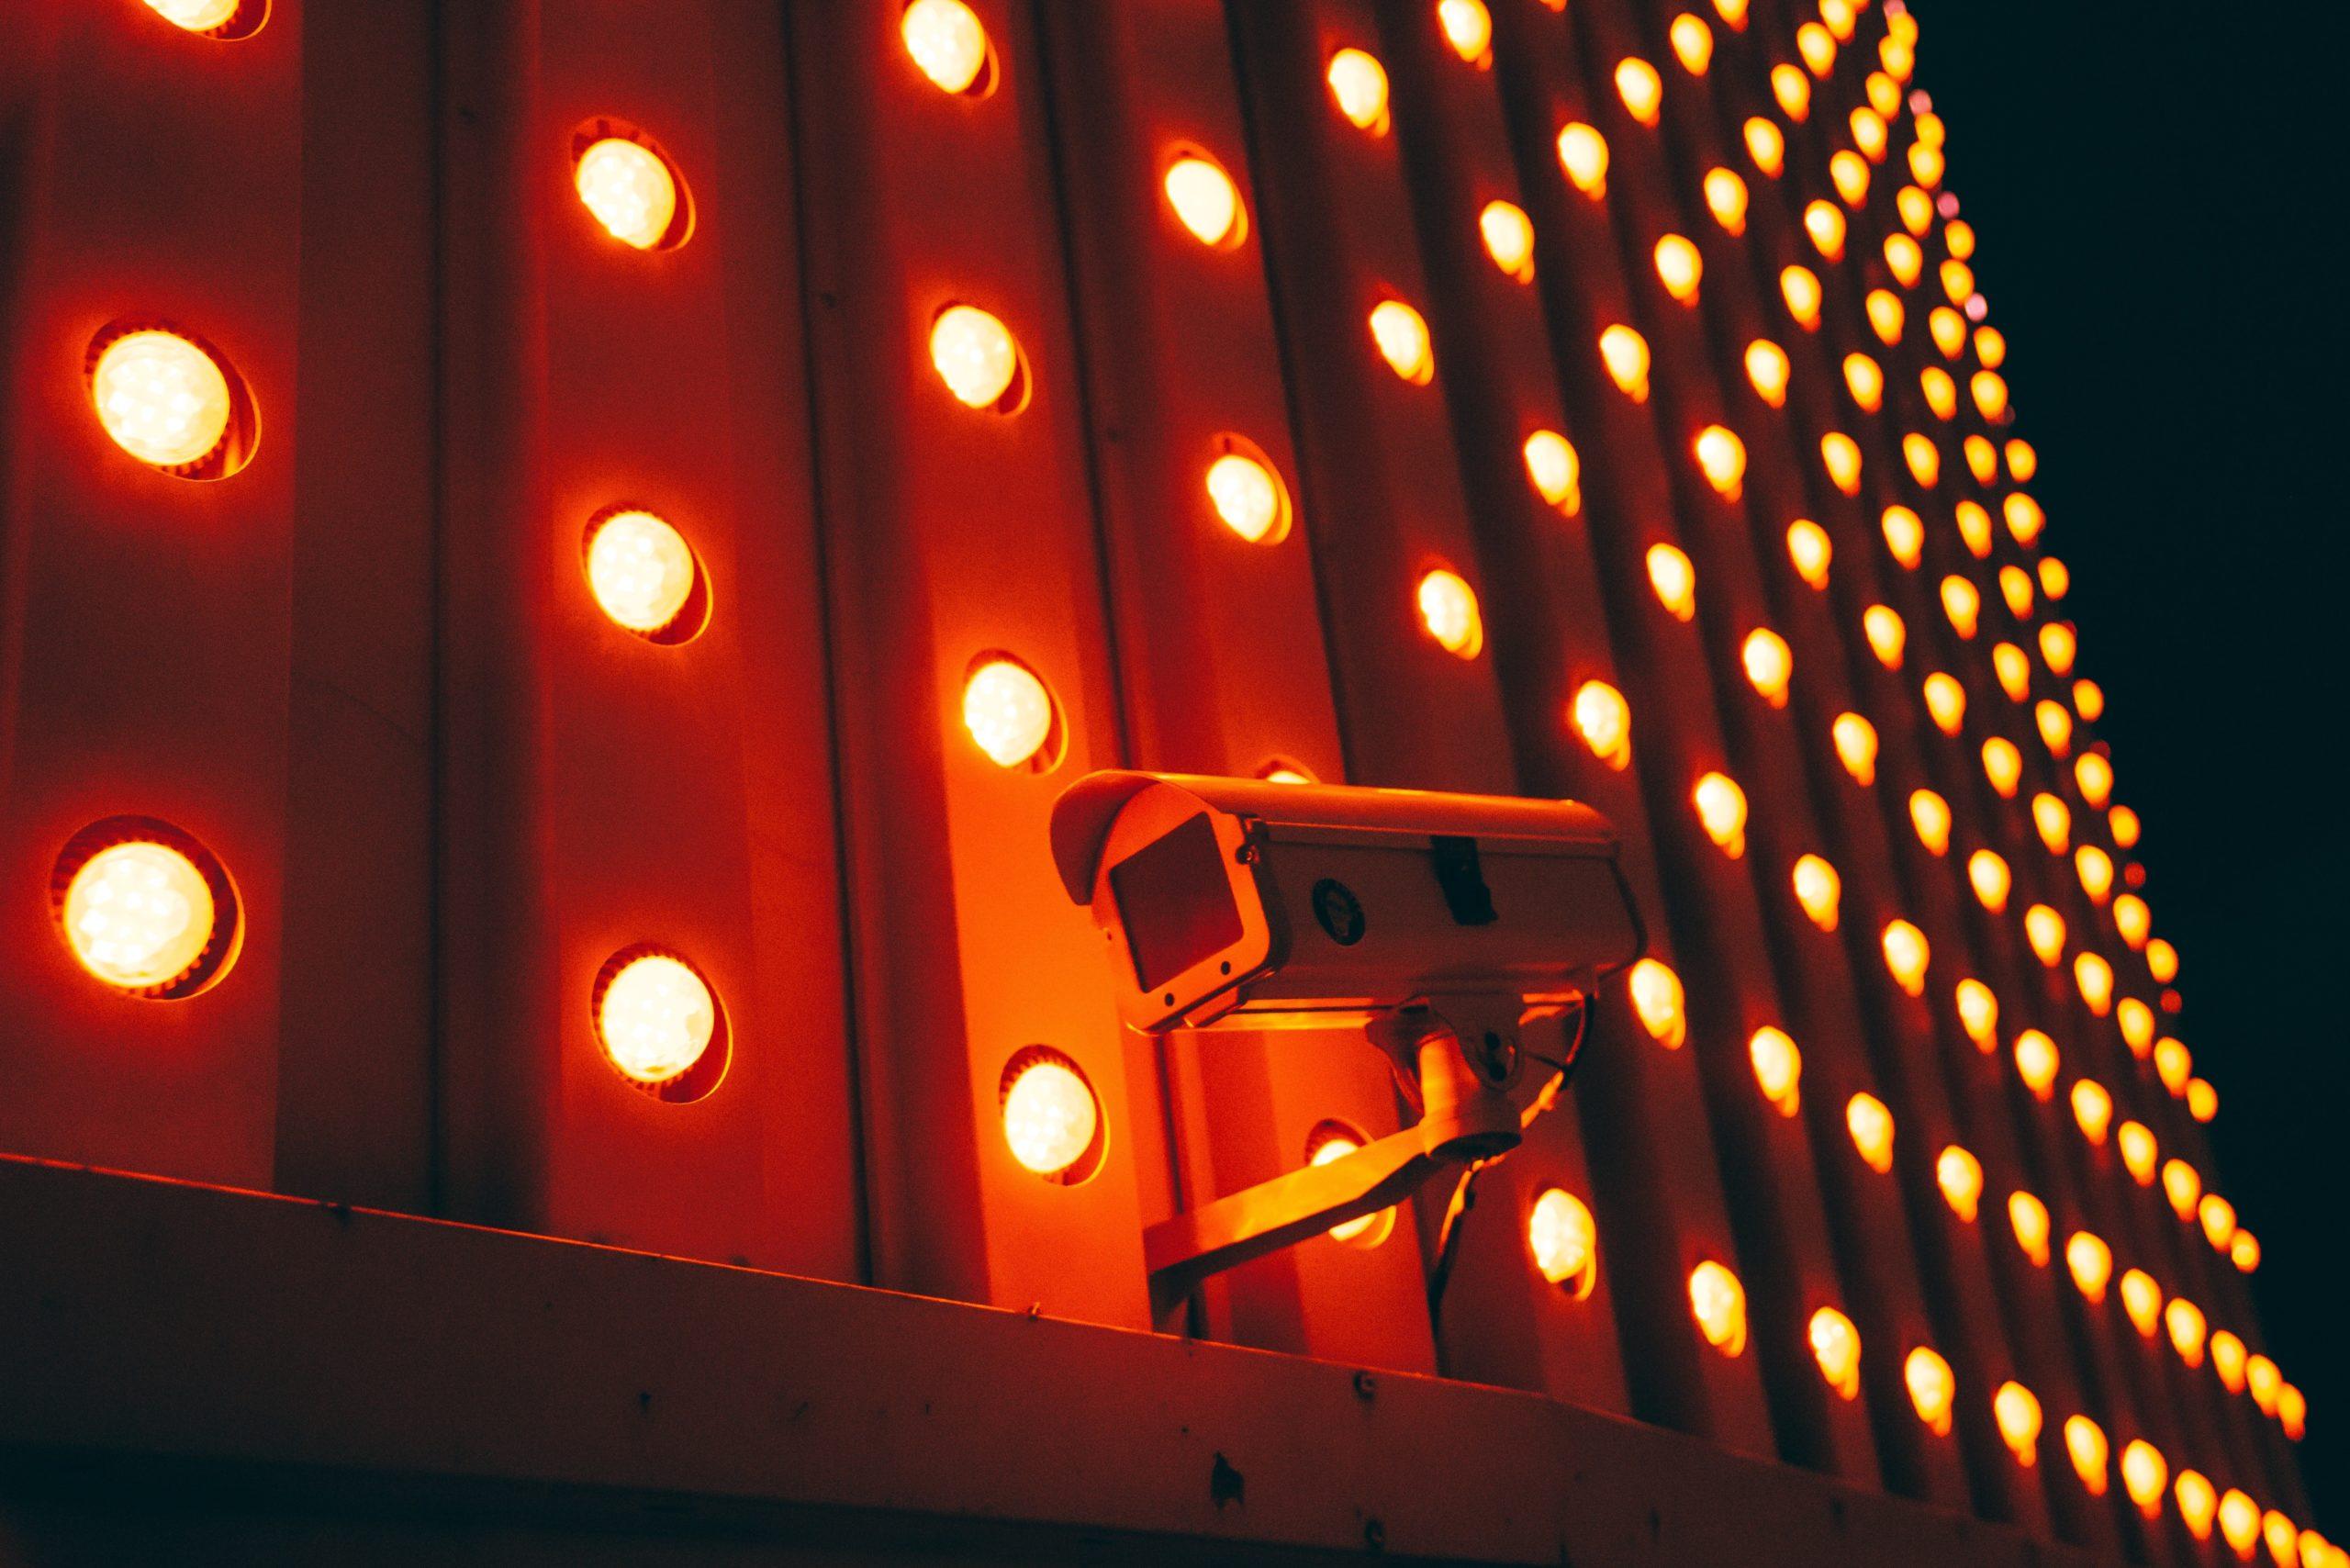 cctv data privacy